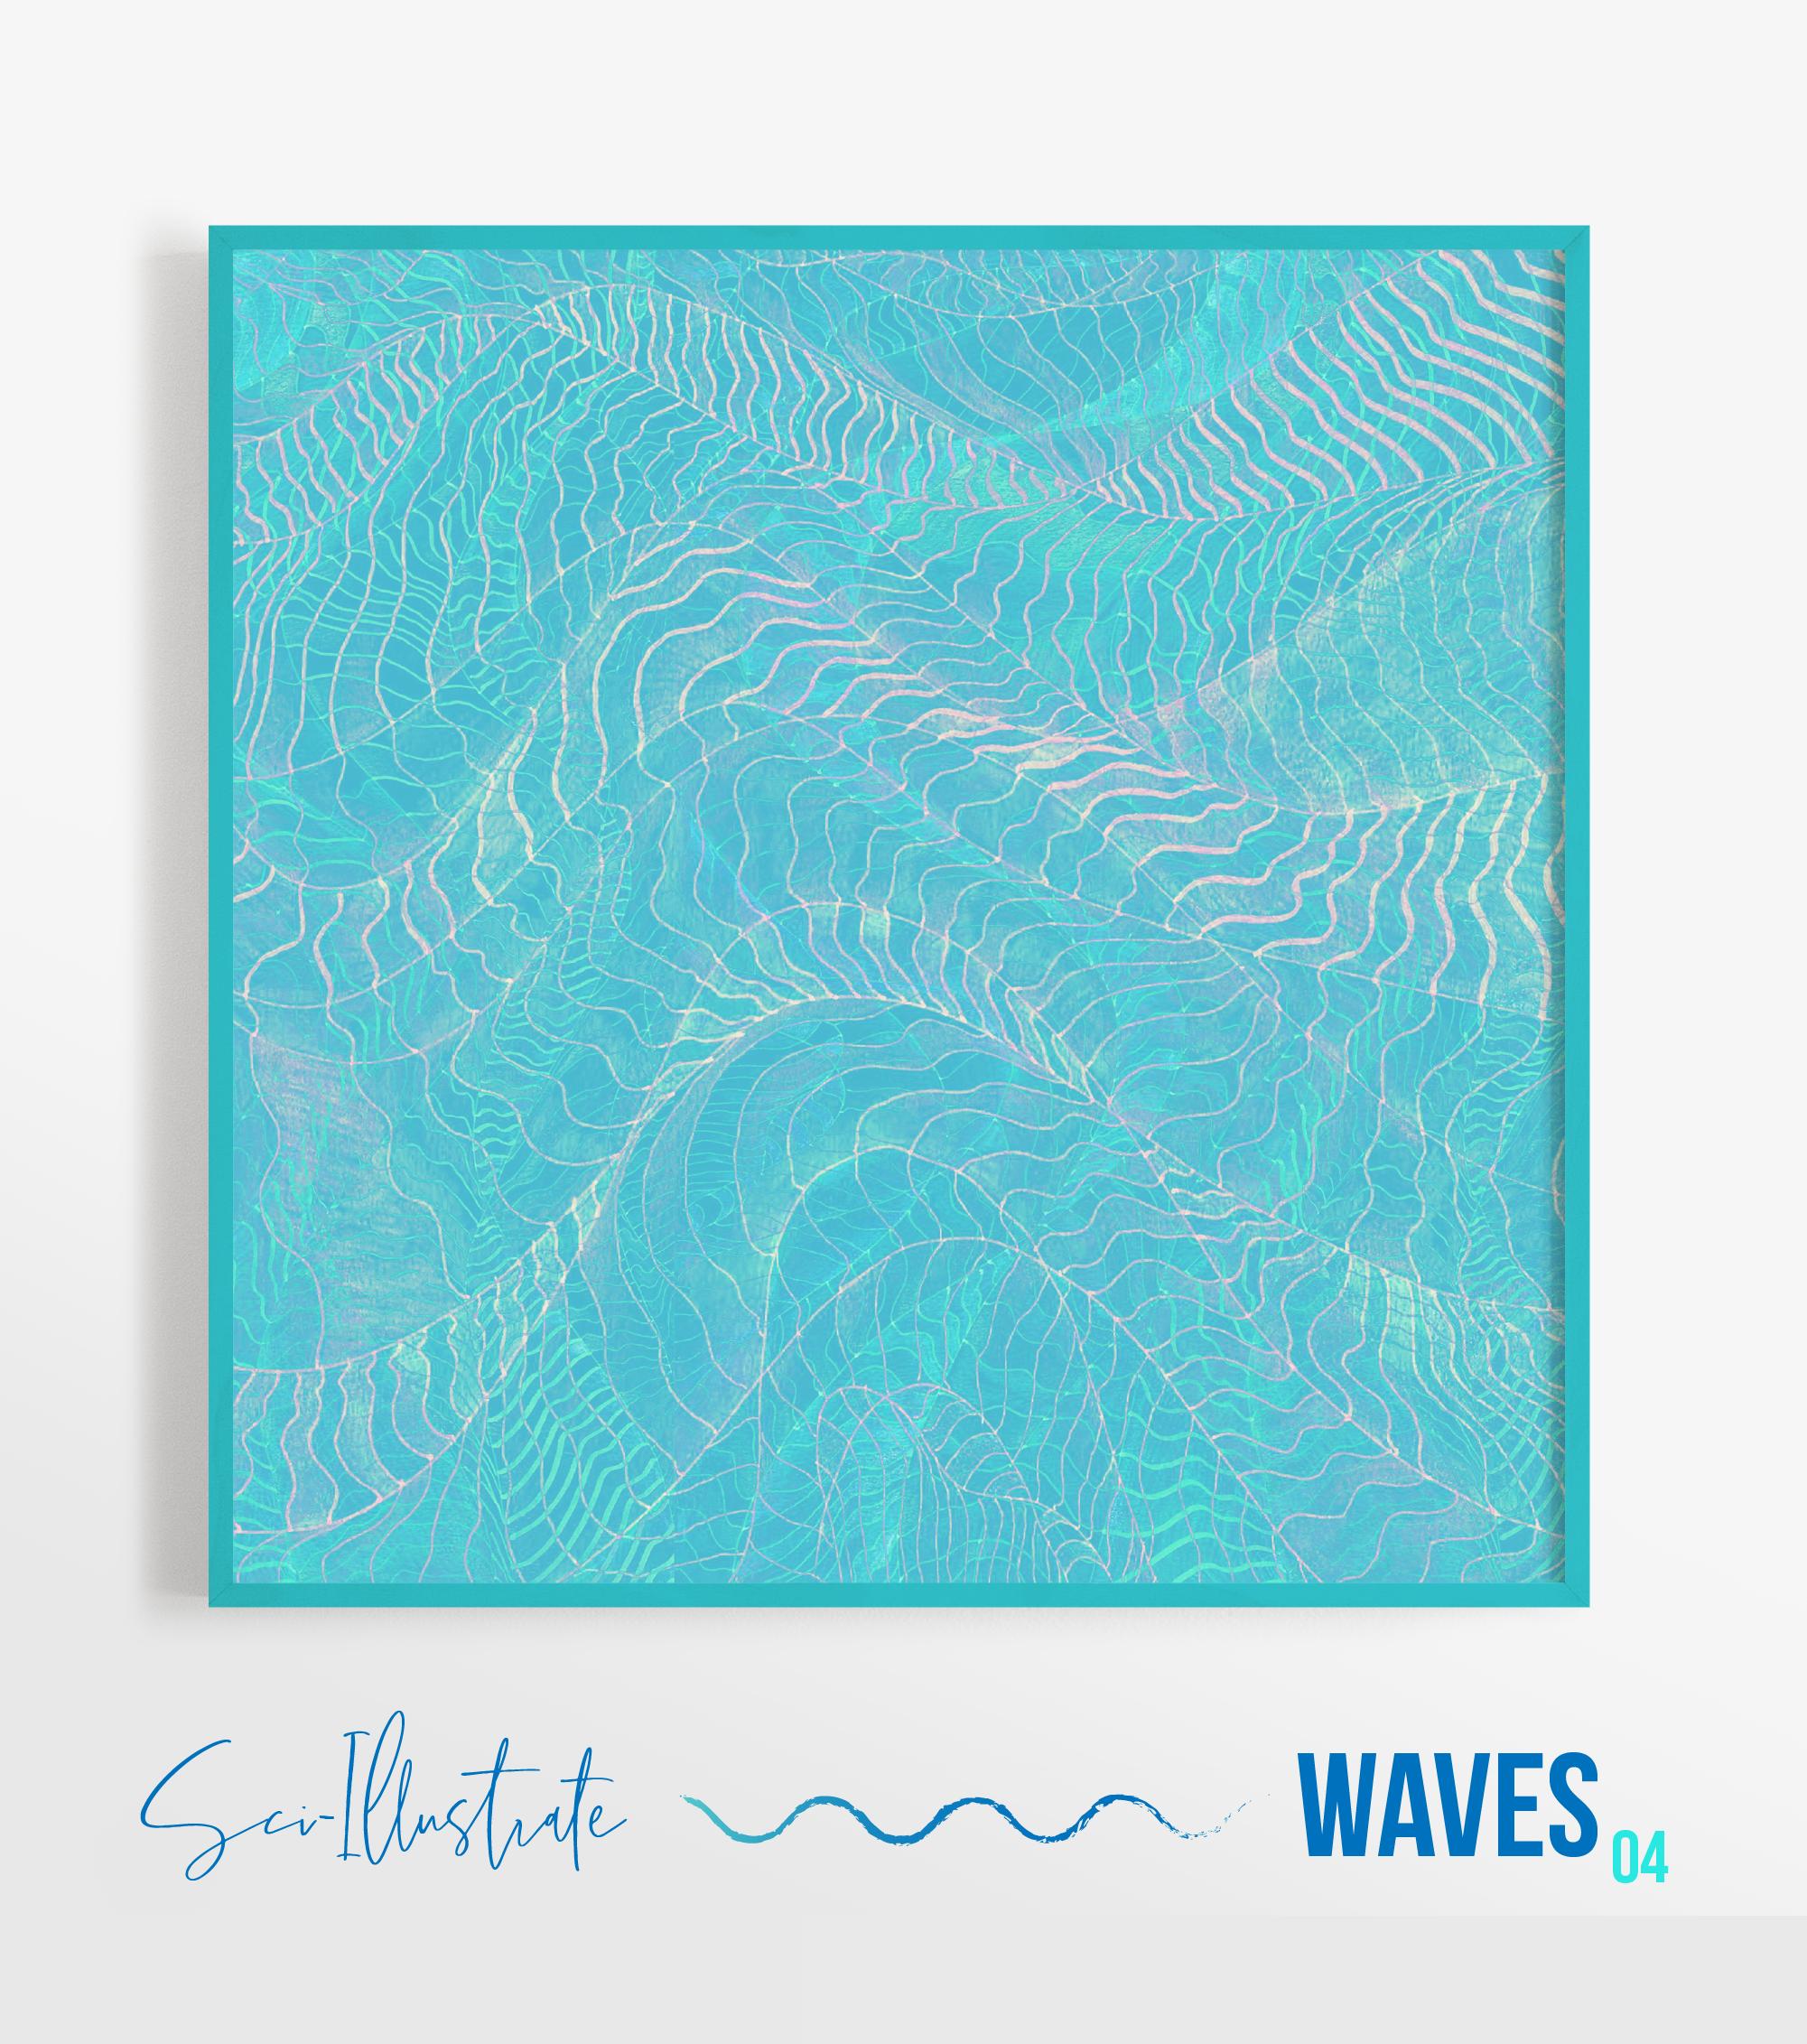 Sci-illustrate waves-04-01.png